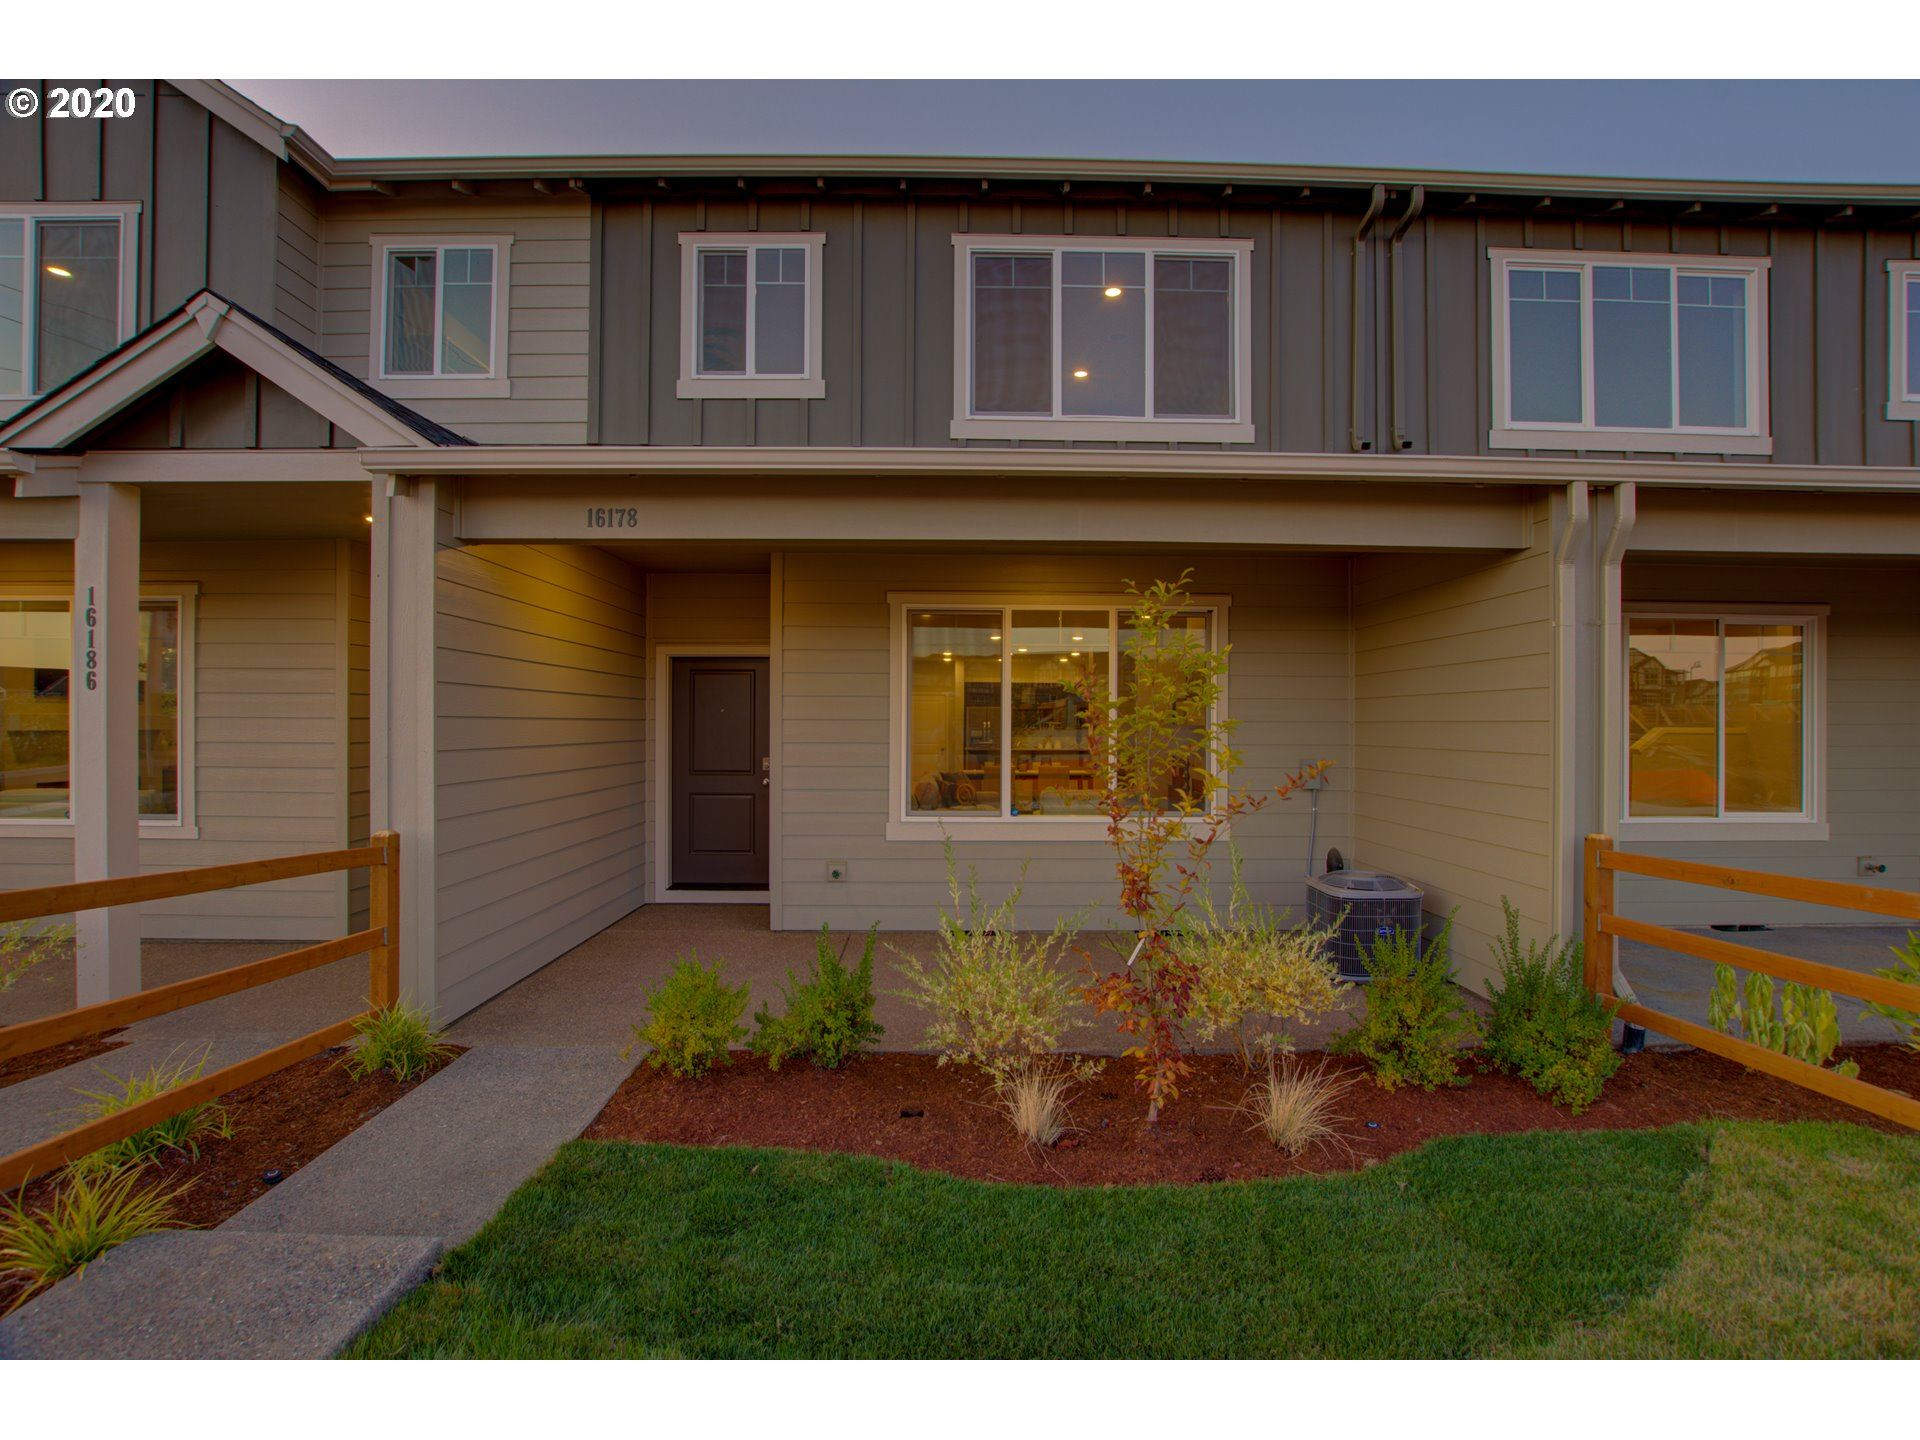 16116 NW PRISTINE LN, Portland, OR 97229 - MLS#: 20133183